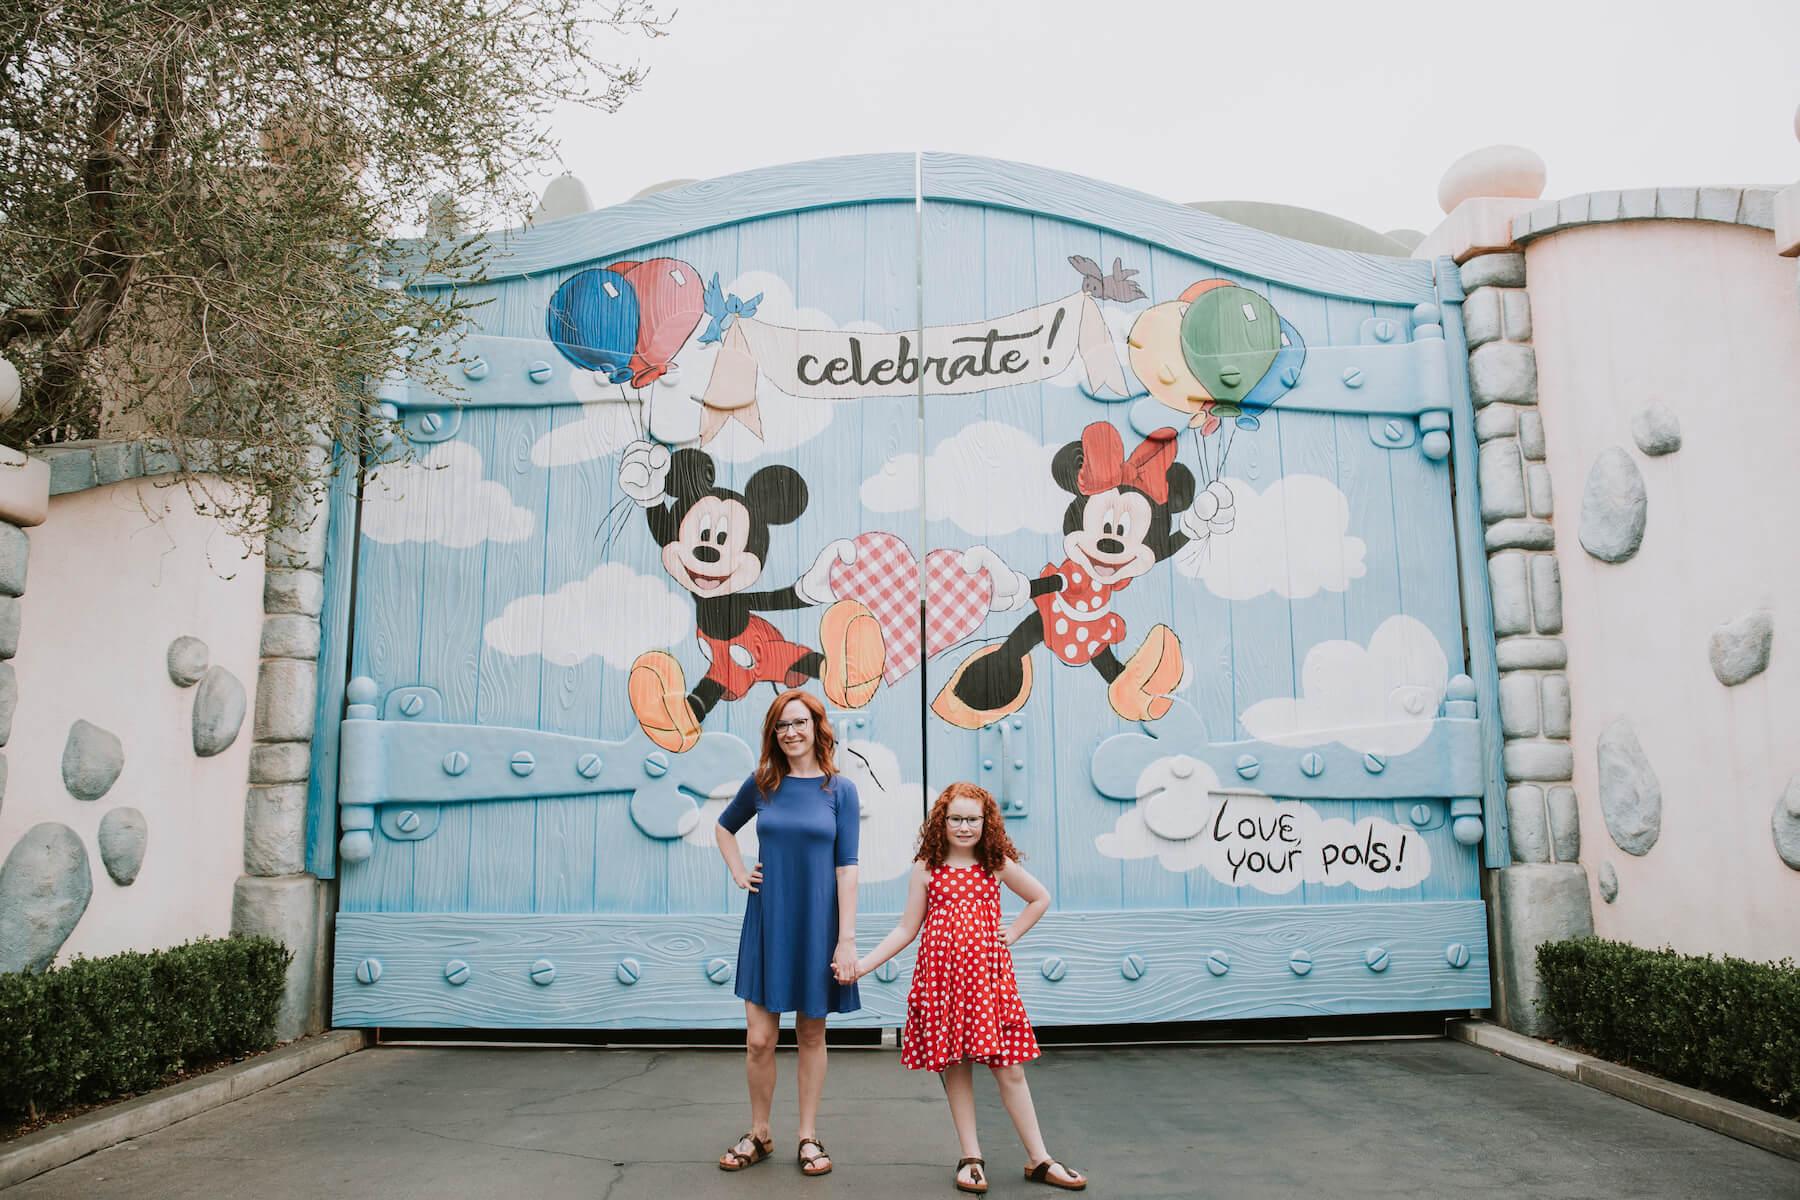 Top 10 Family Airbnb's Near Disneyland